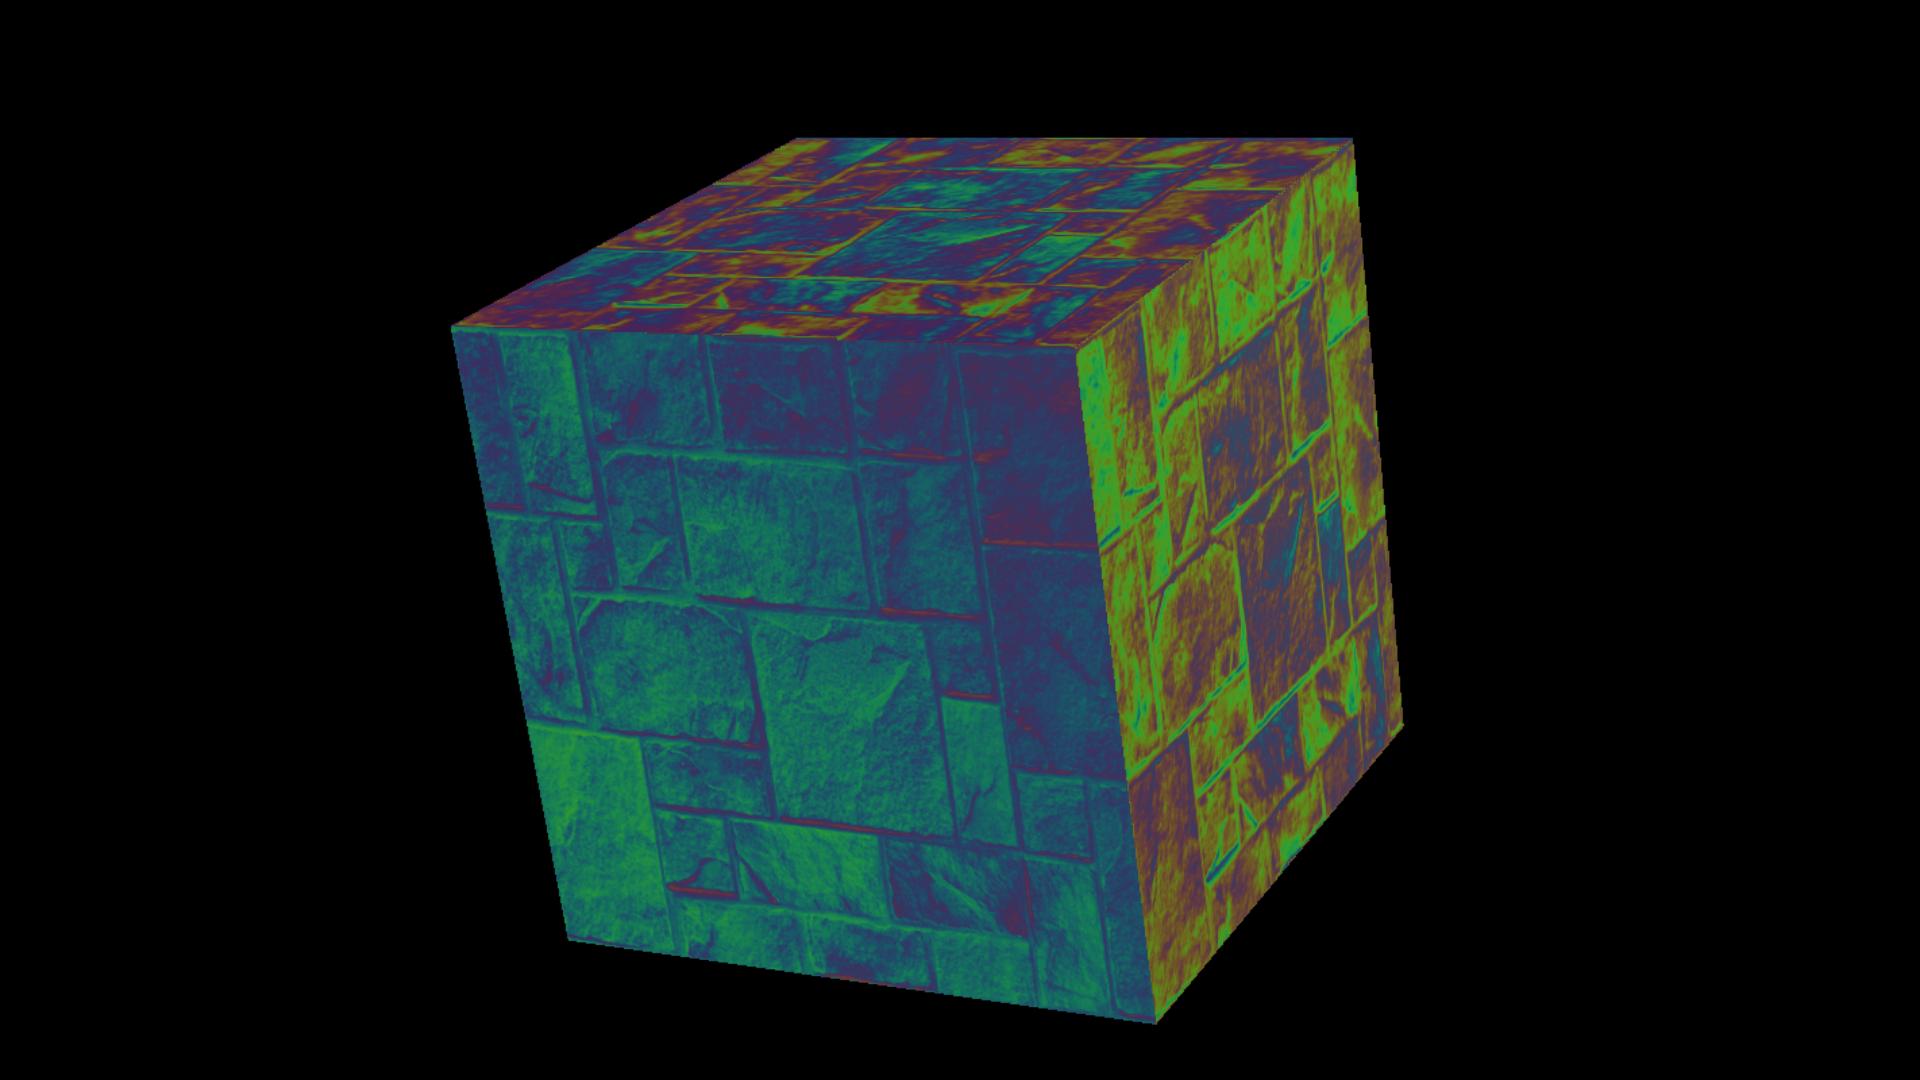 Iridescent/Hologram/Raymarching shader